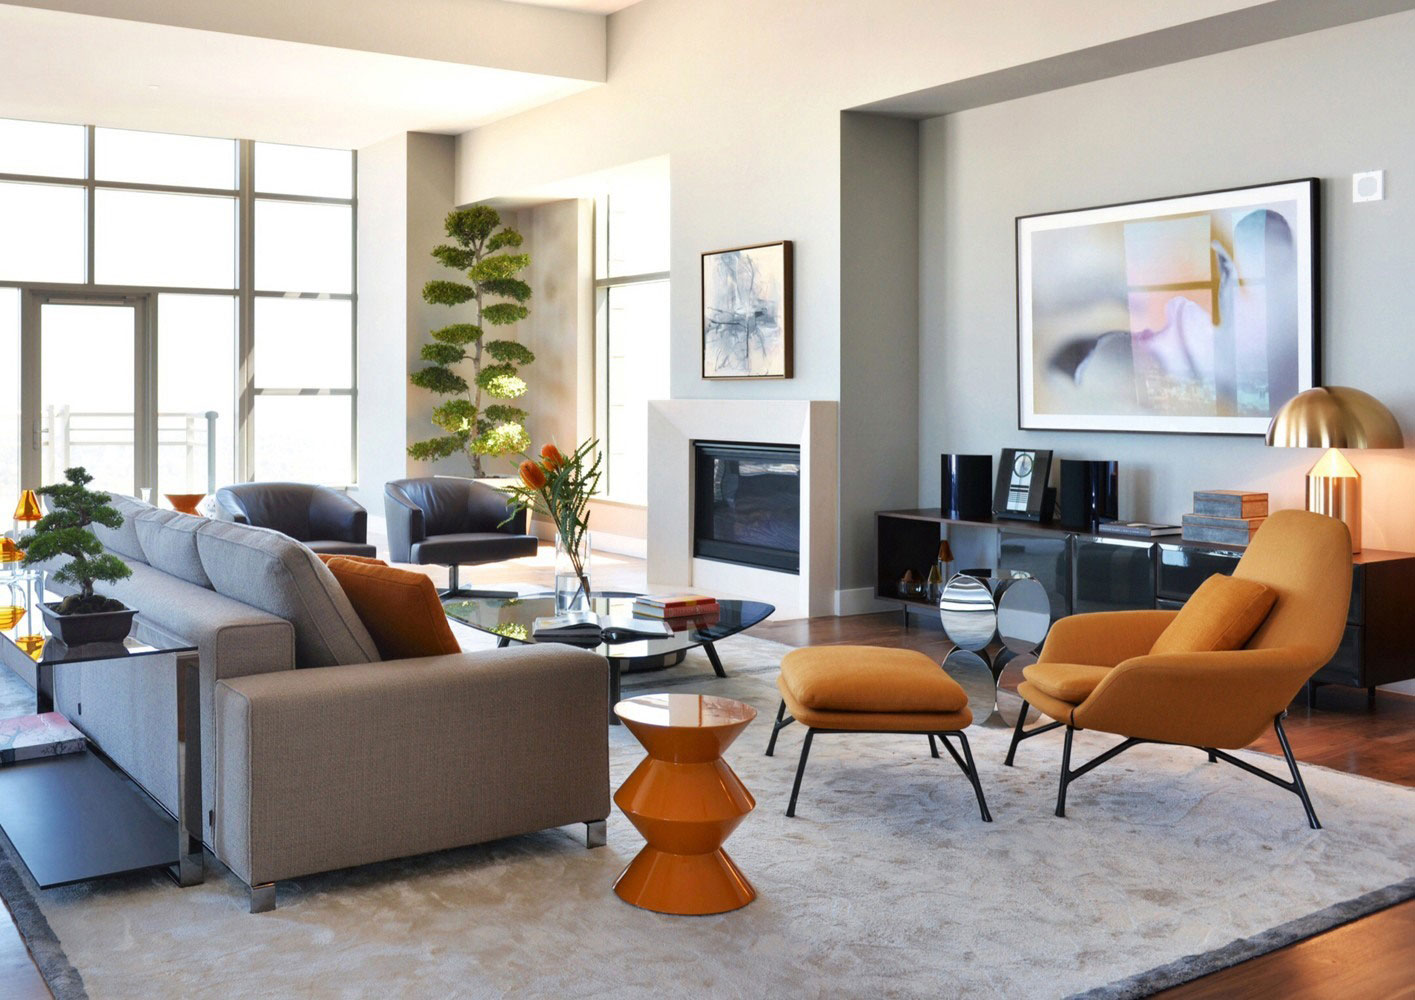 Carlyle residence penthouse by minotti - Sillas para salones ...